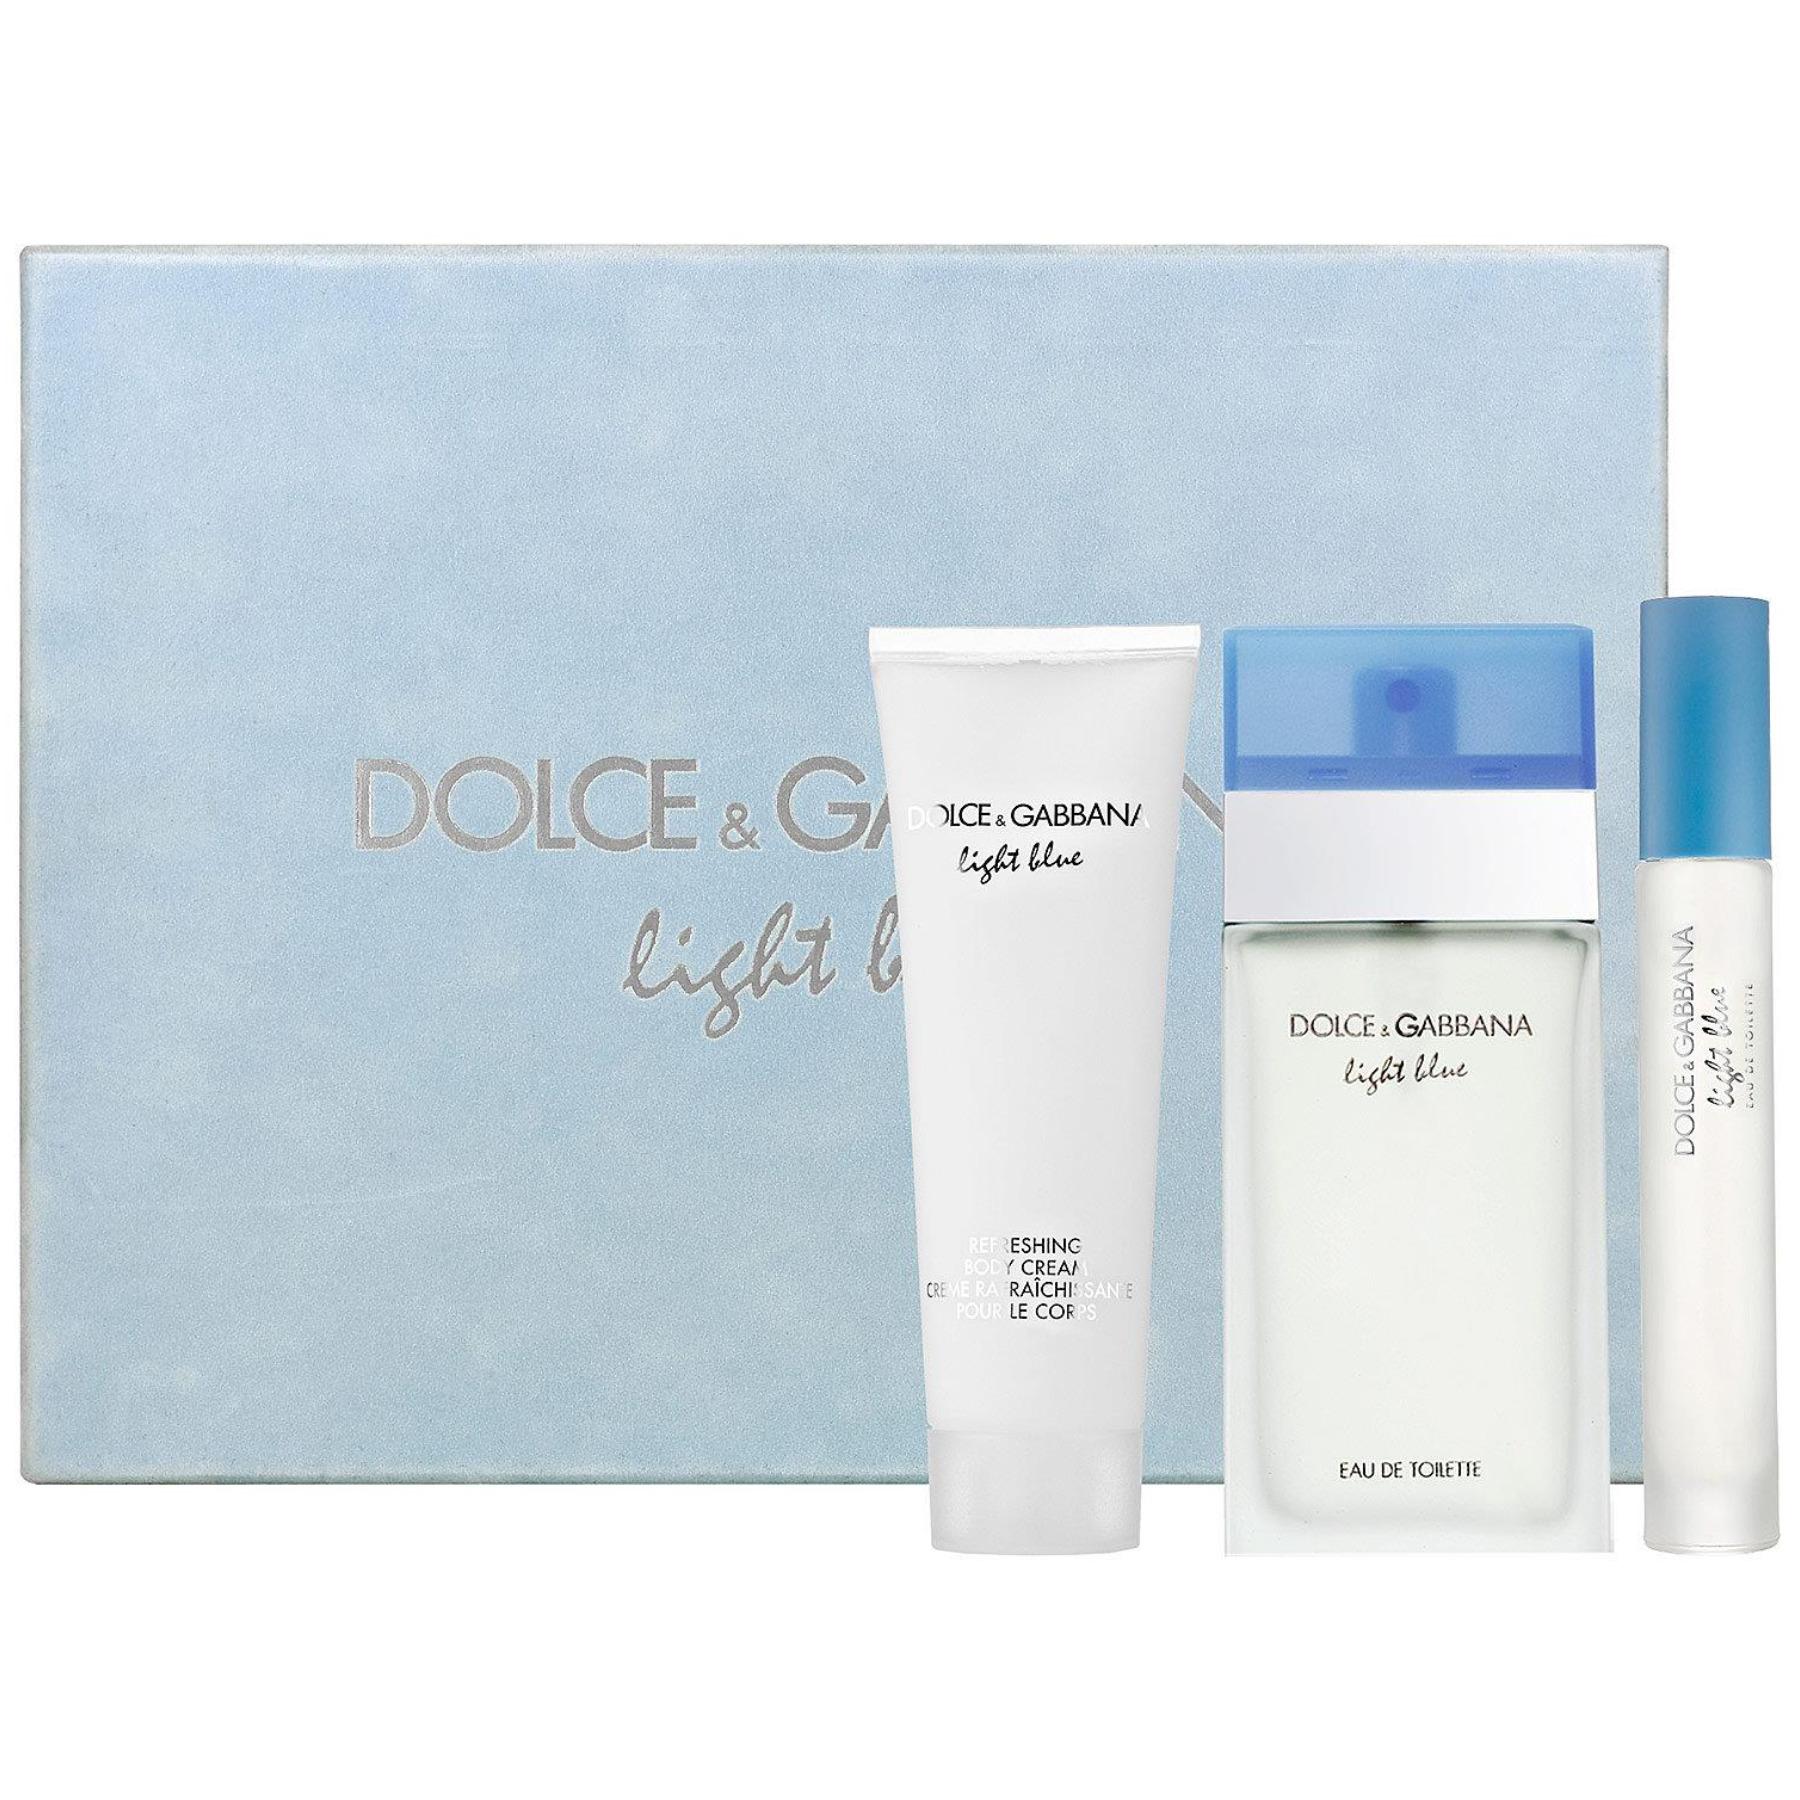 Dolce  Gabbana Light Blue Edt 100ml + 100ml Body cream + 7 4ml Edt 100ml Smaržas sievietēm